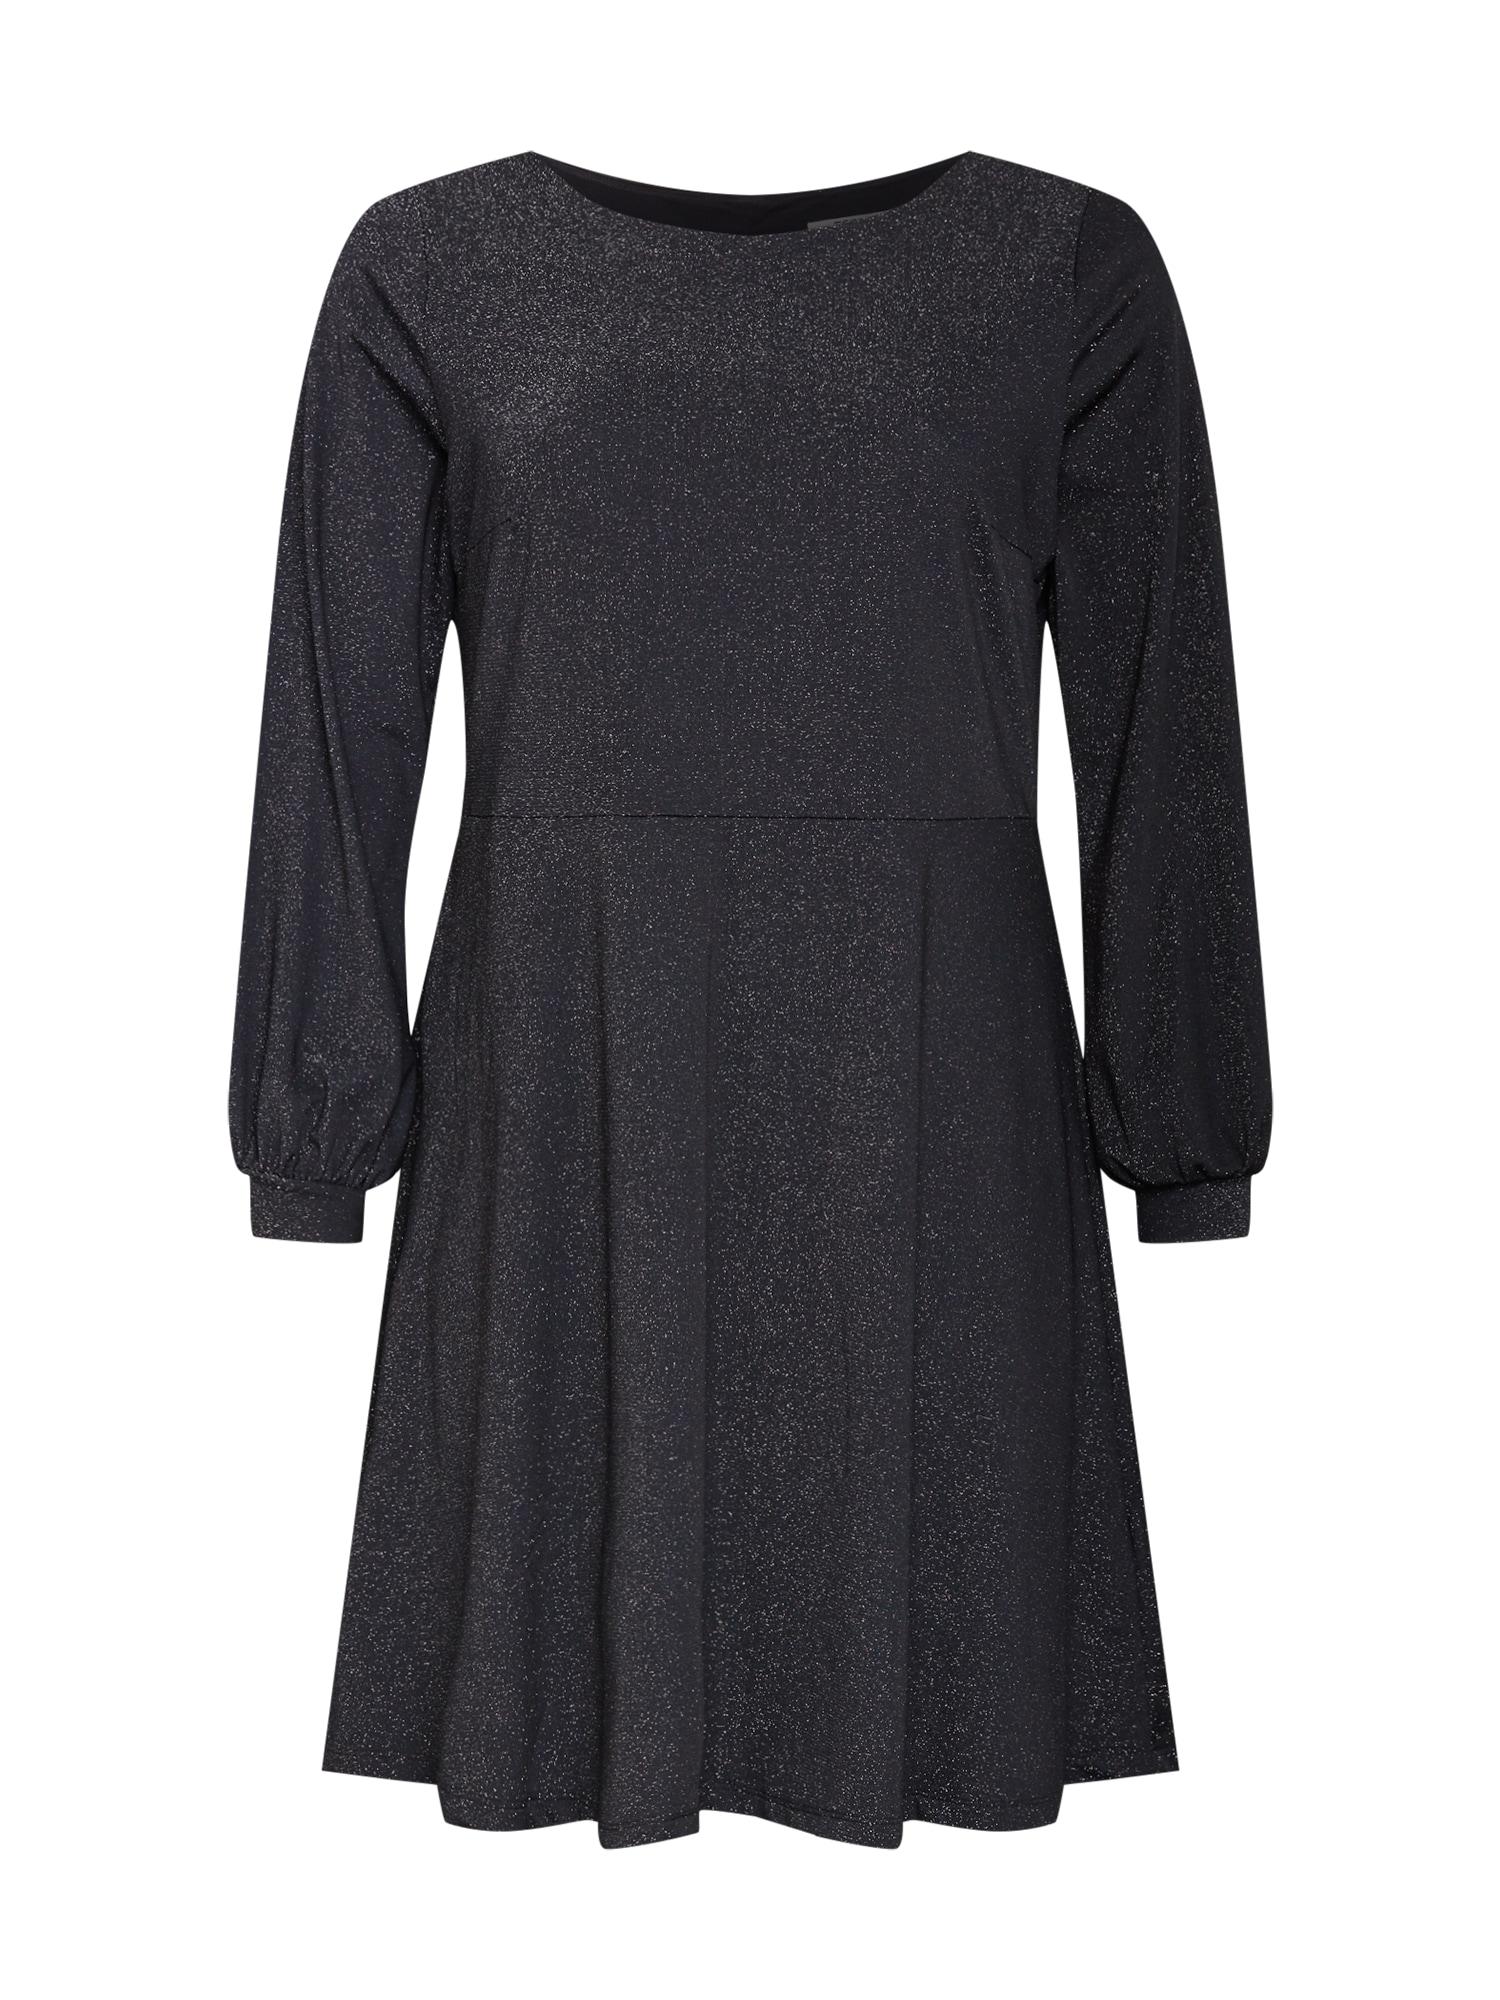 Esprit Curves Suknelė juoda